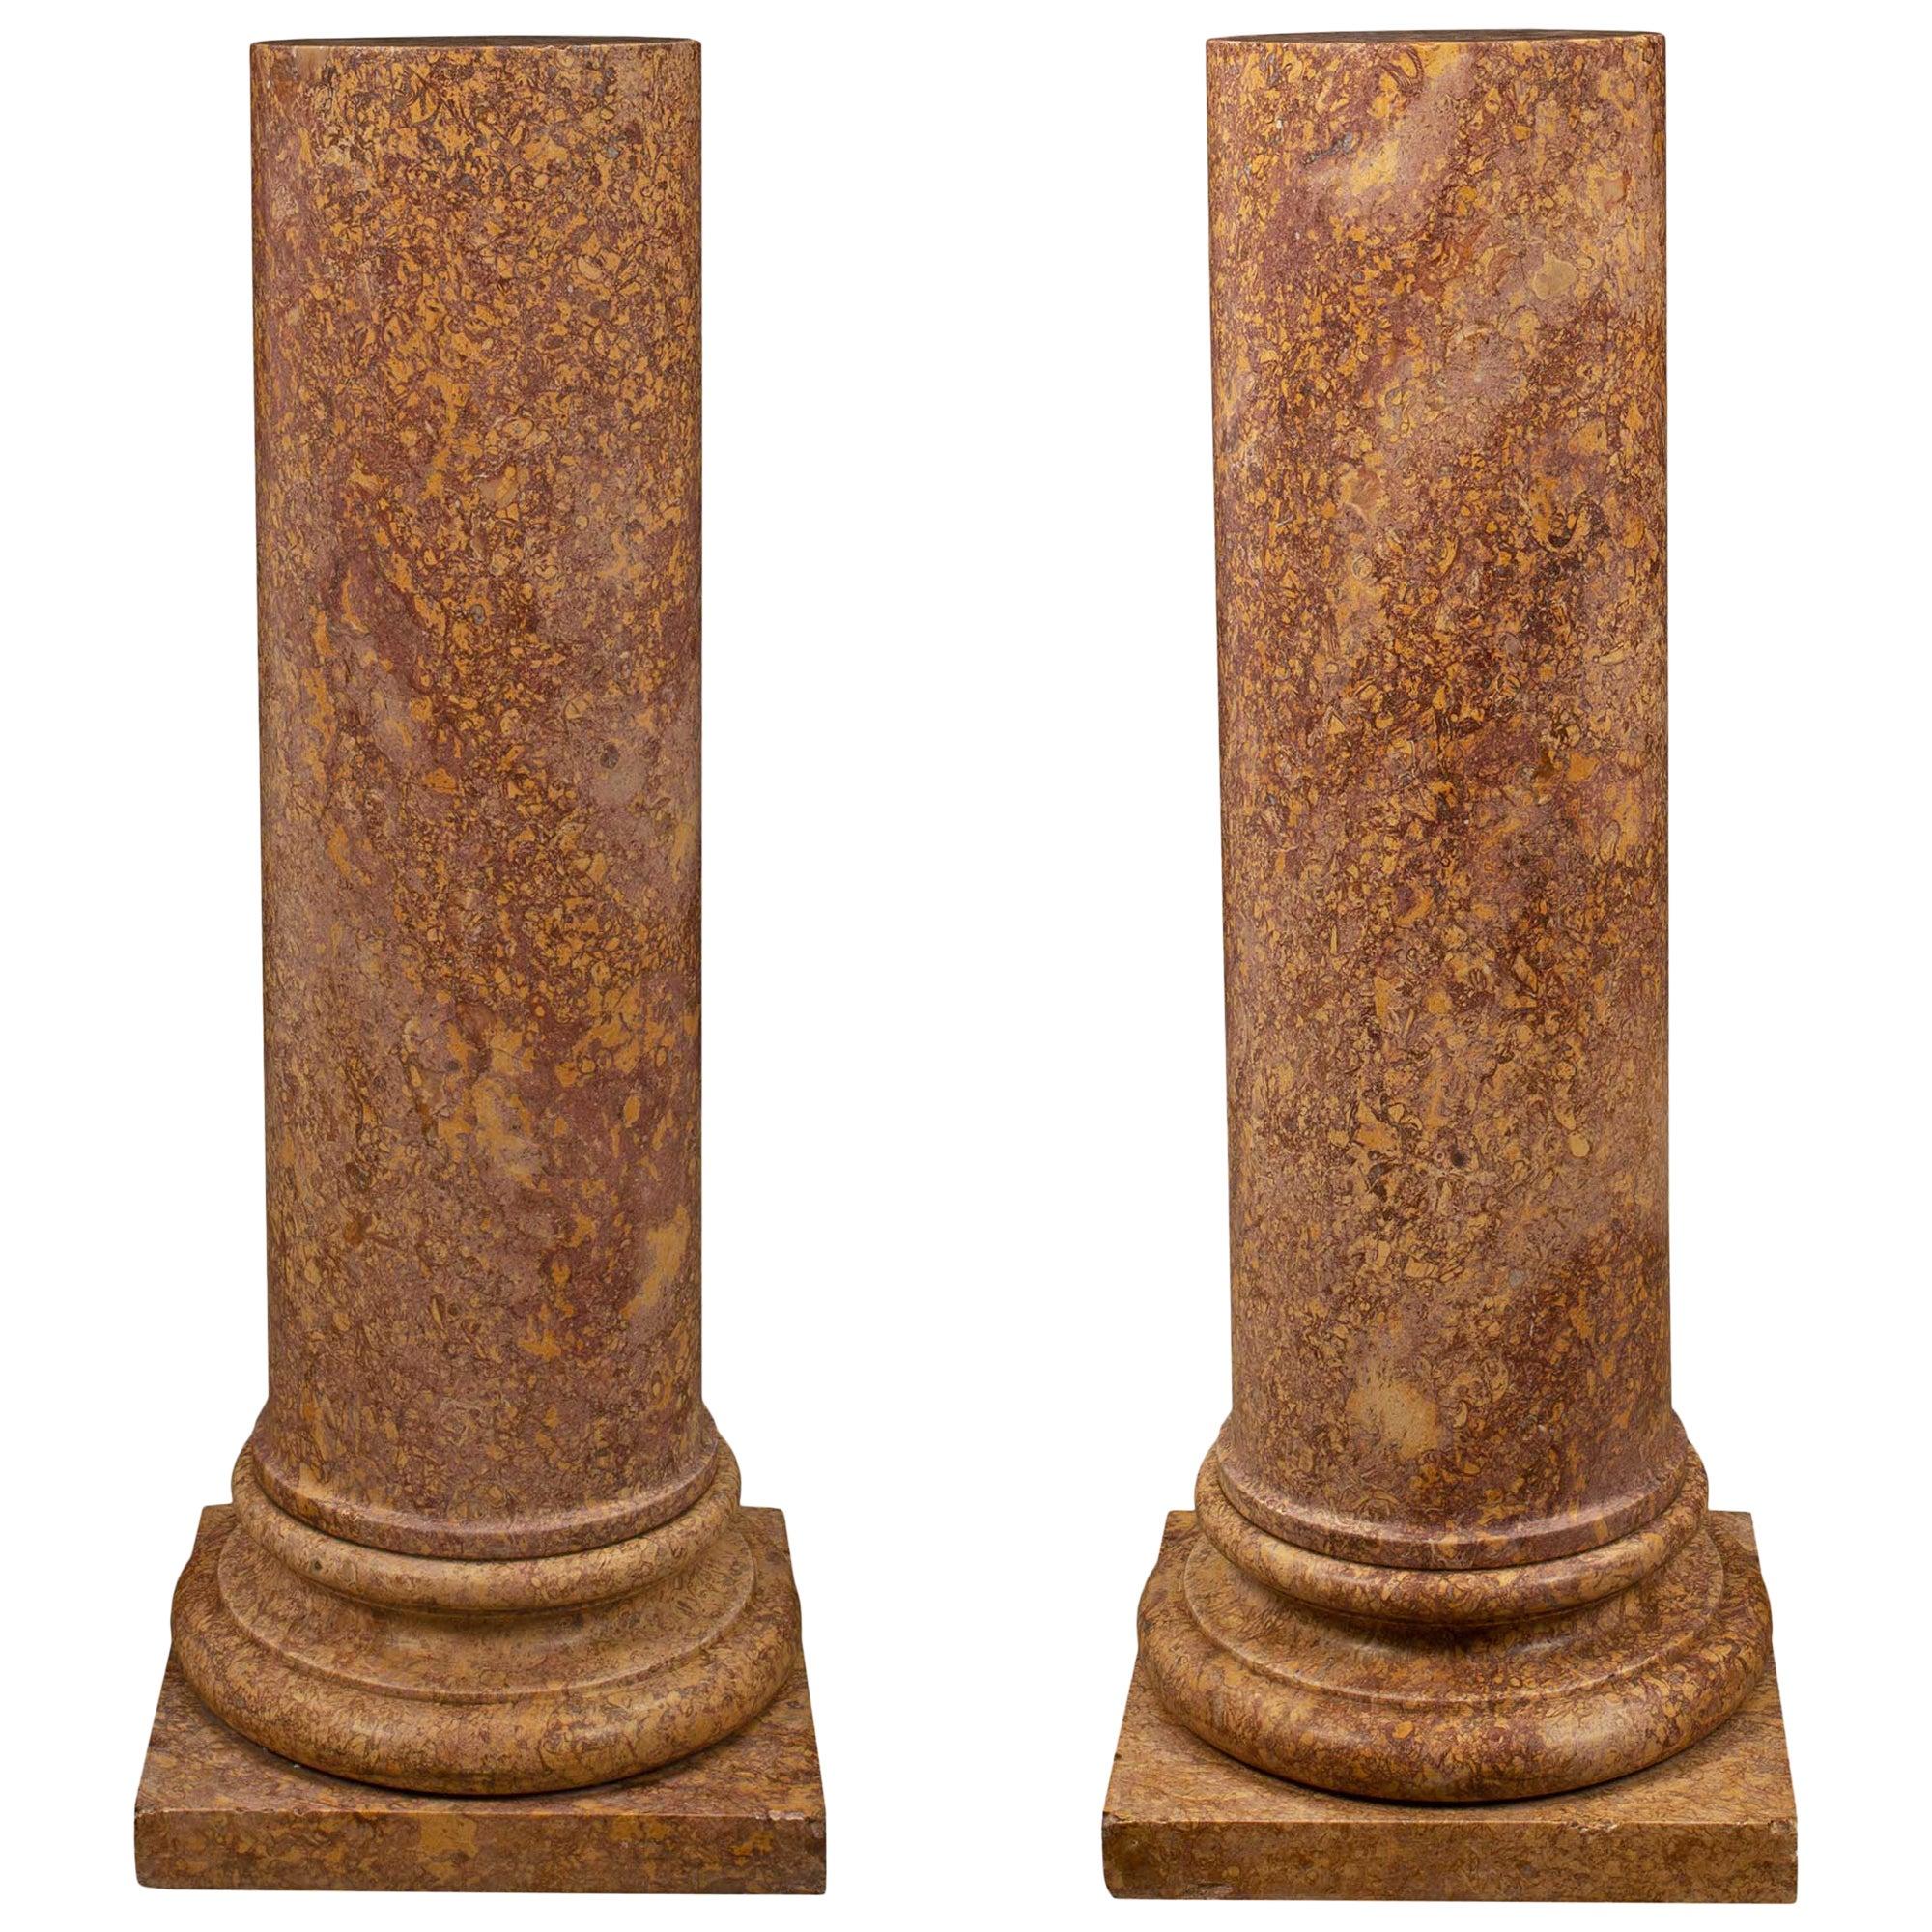 Italian 19th Century Neoclassical St. Marble Pedestal Columns